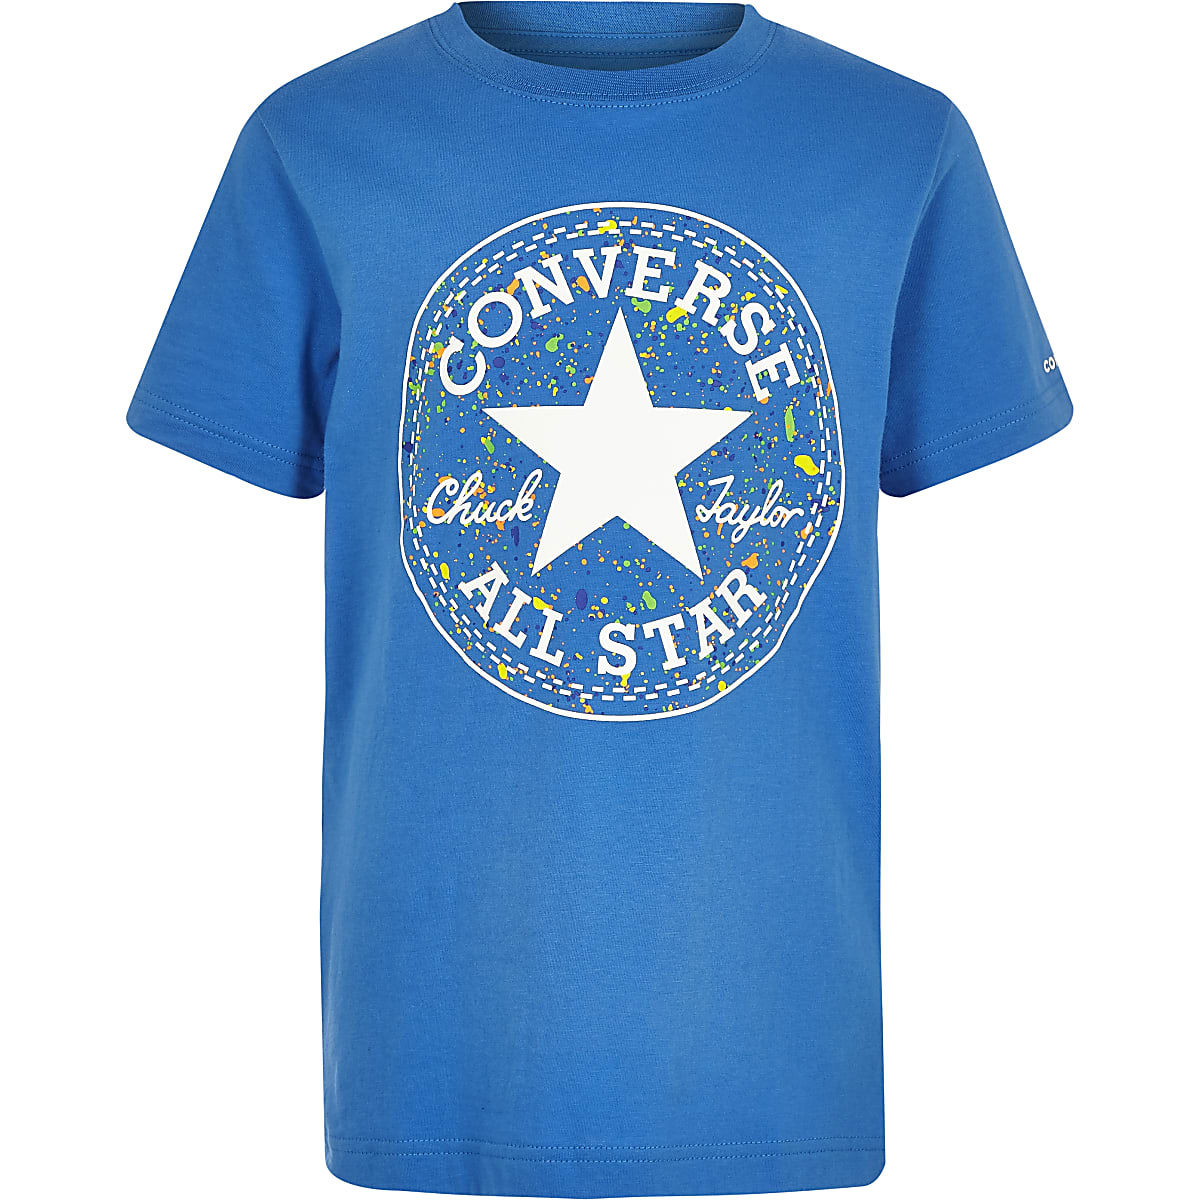 Converse – Blaues T-Shirt mit Logo